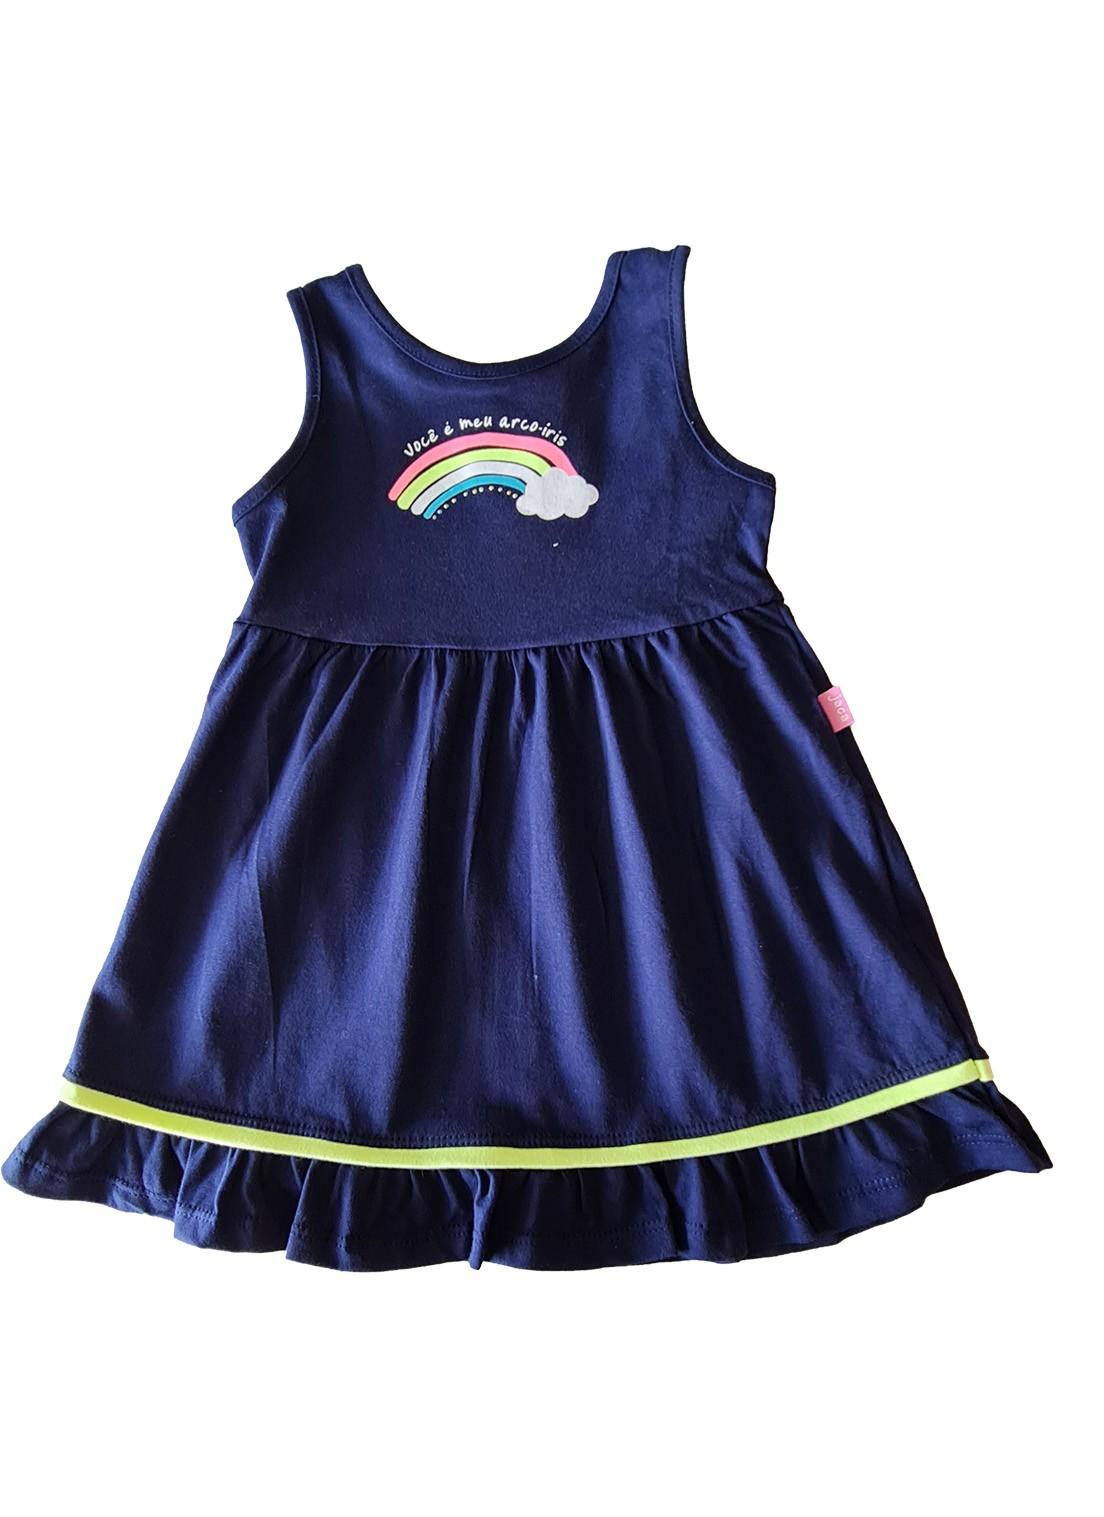 Vestido Infantil  regata JACA-LELÉ  Arco Íris Marinho